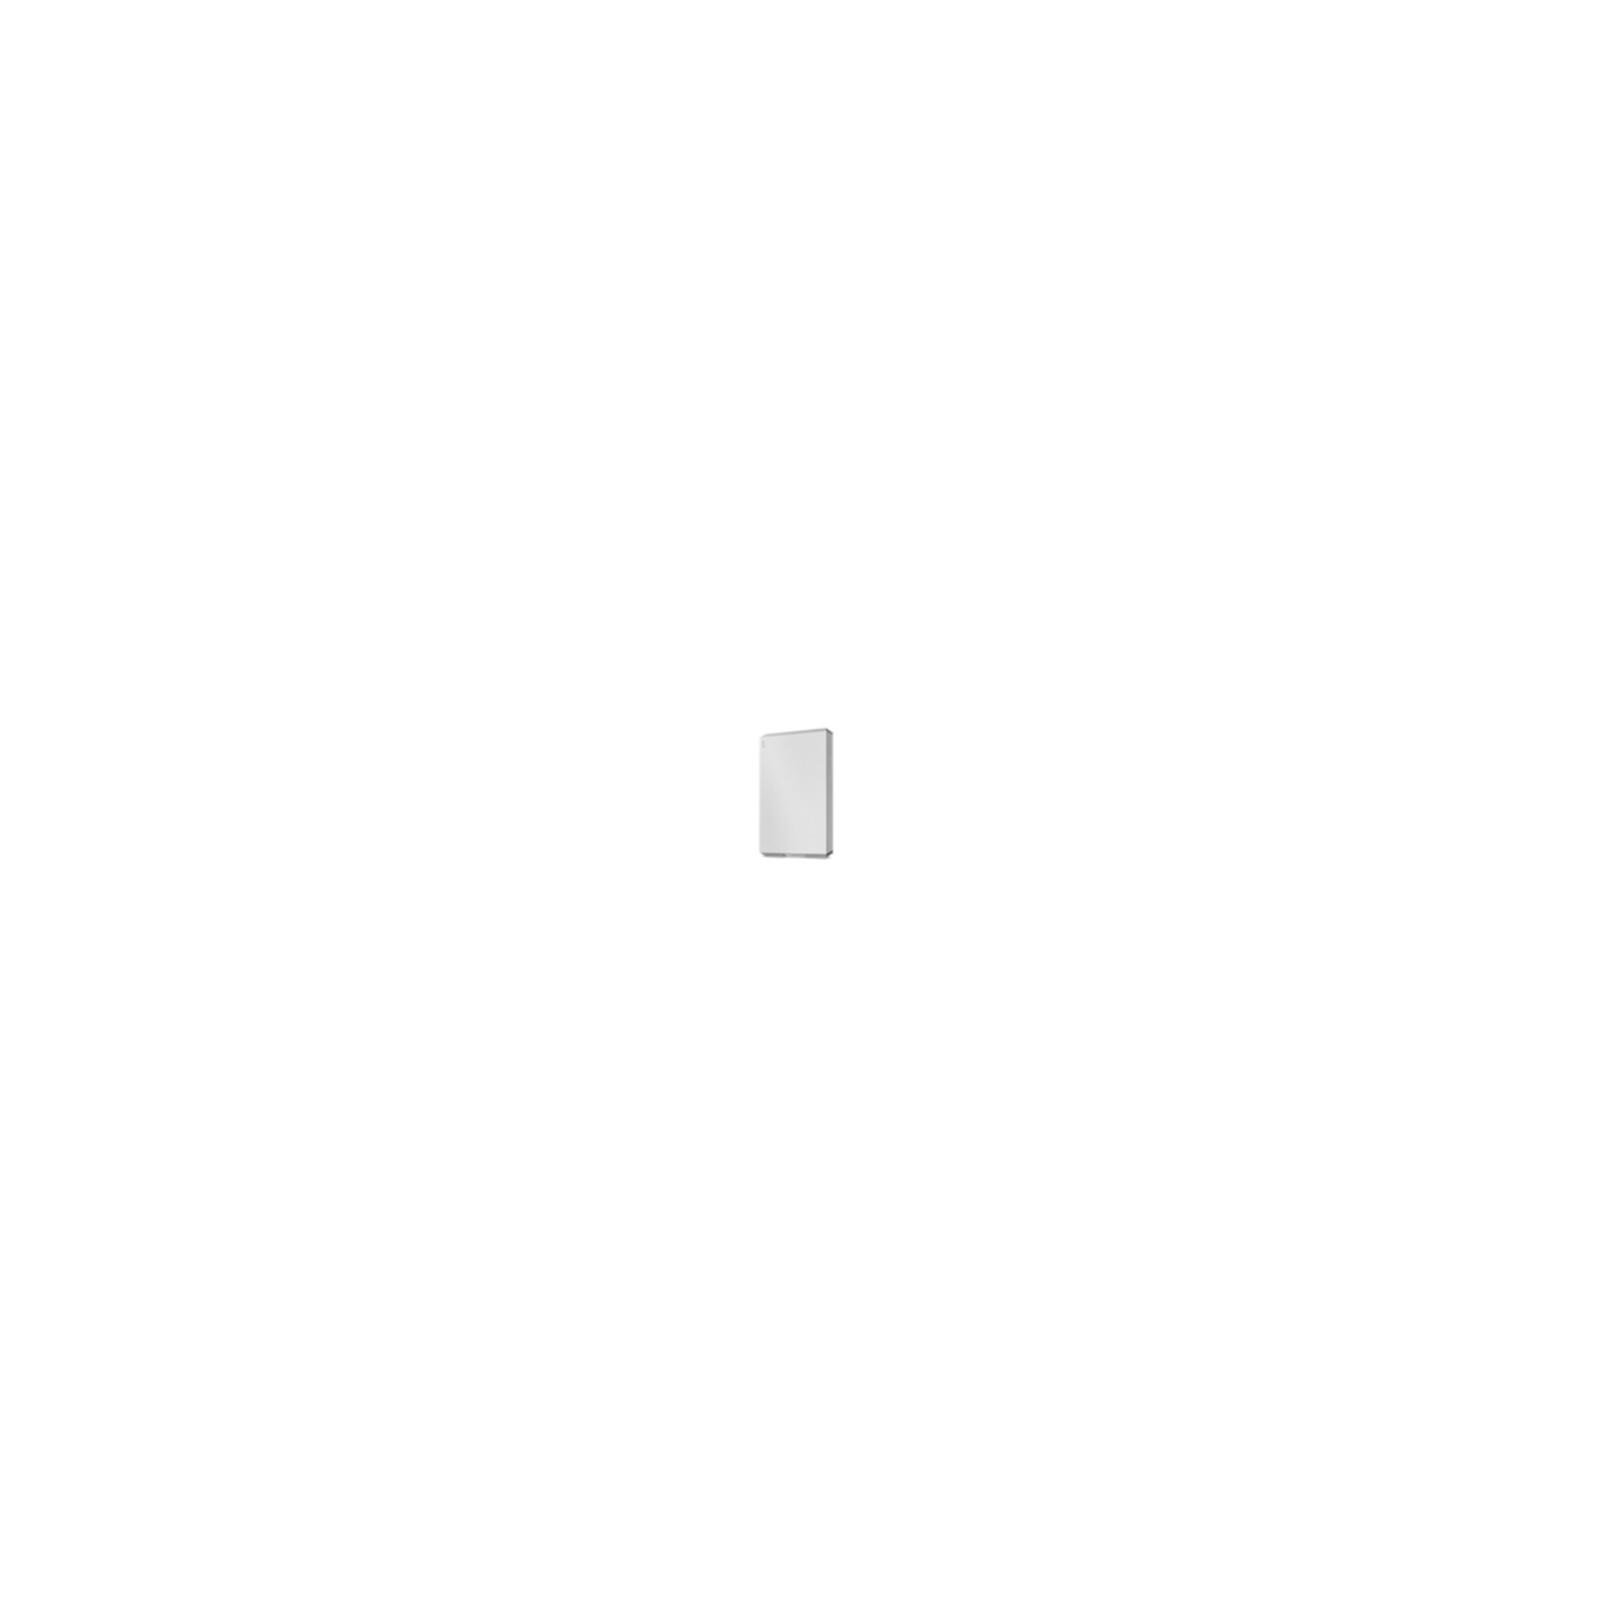 "LaCie Mobile Drive 4TB, 2.5"" USB C"